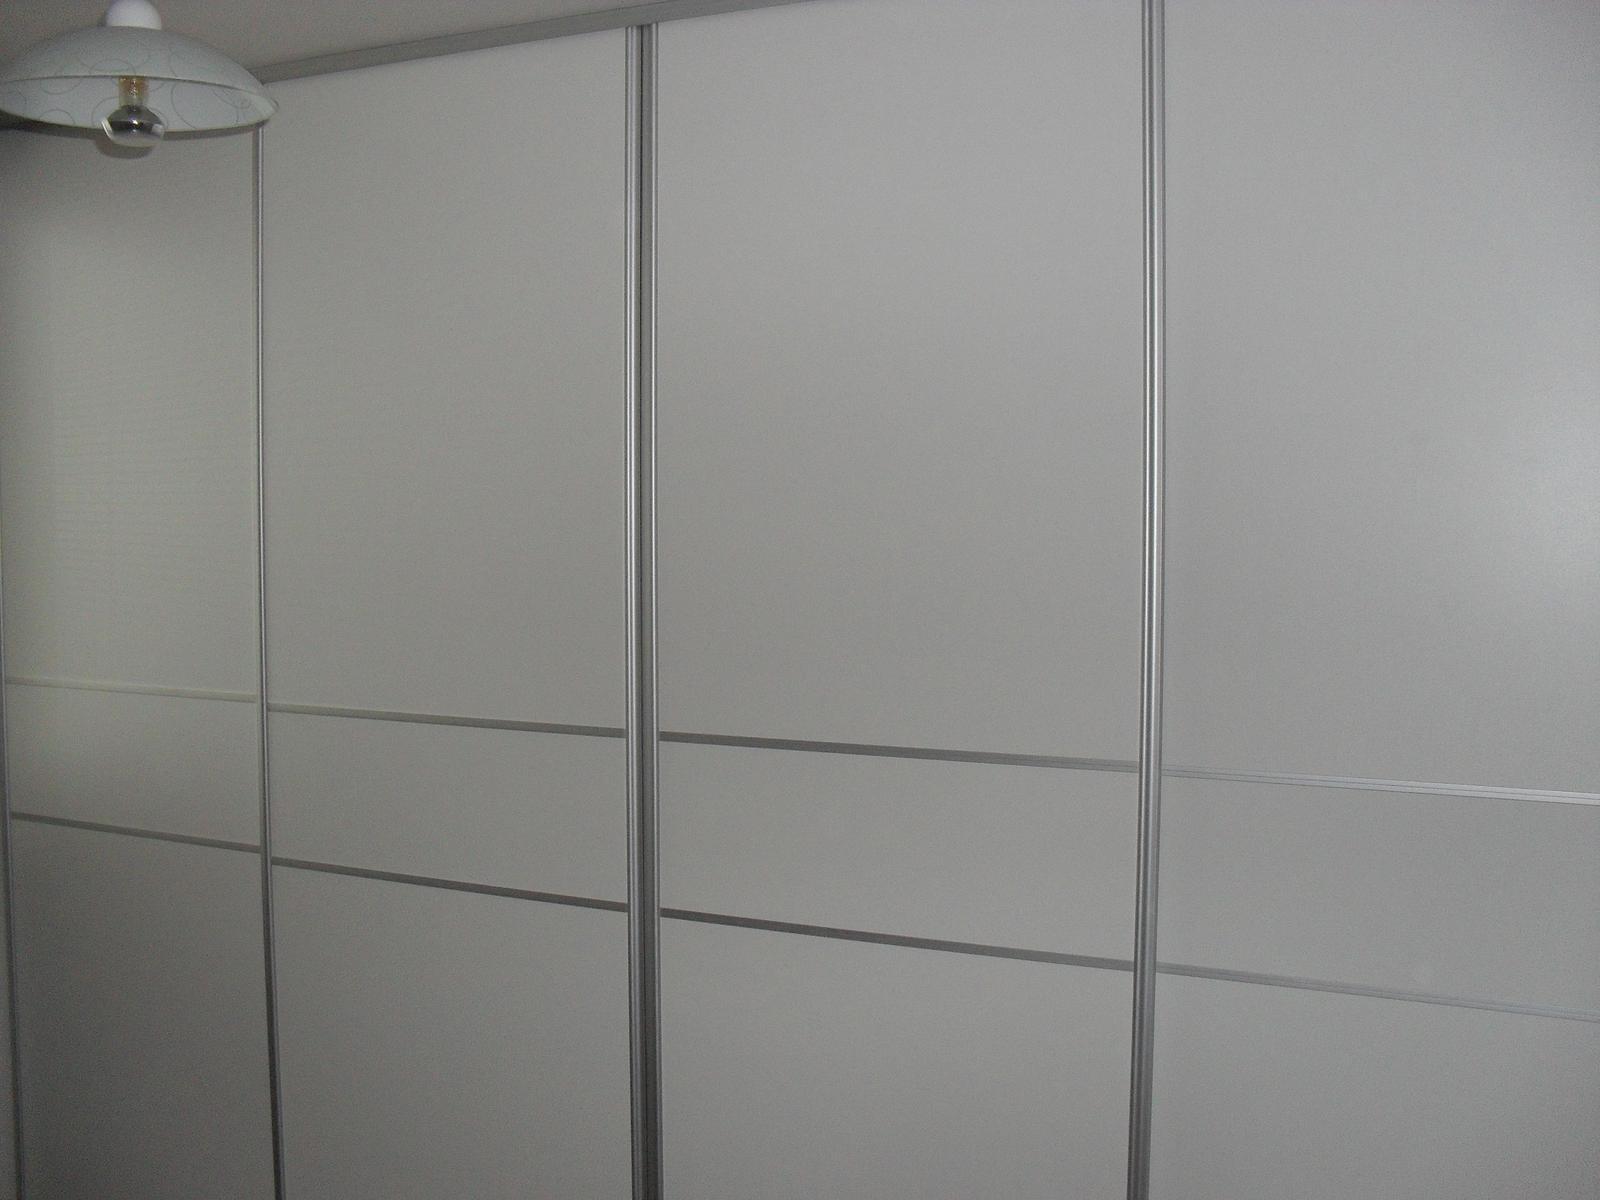 Vstavané skrine Martin Benko Bošany - Obrázok č. 42